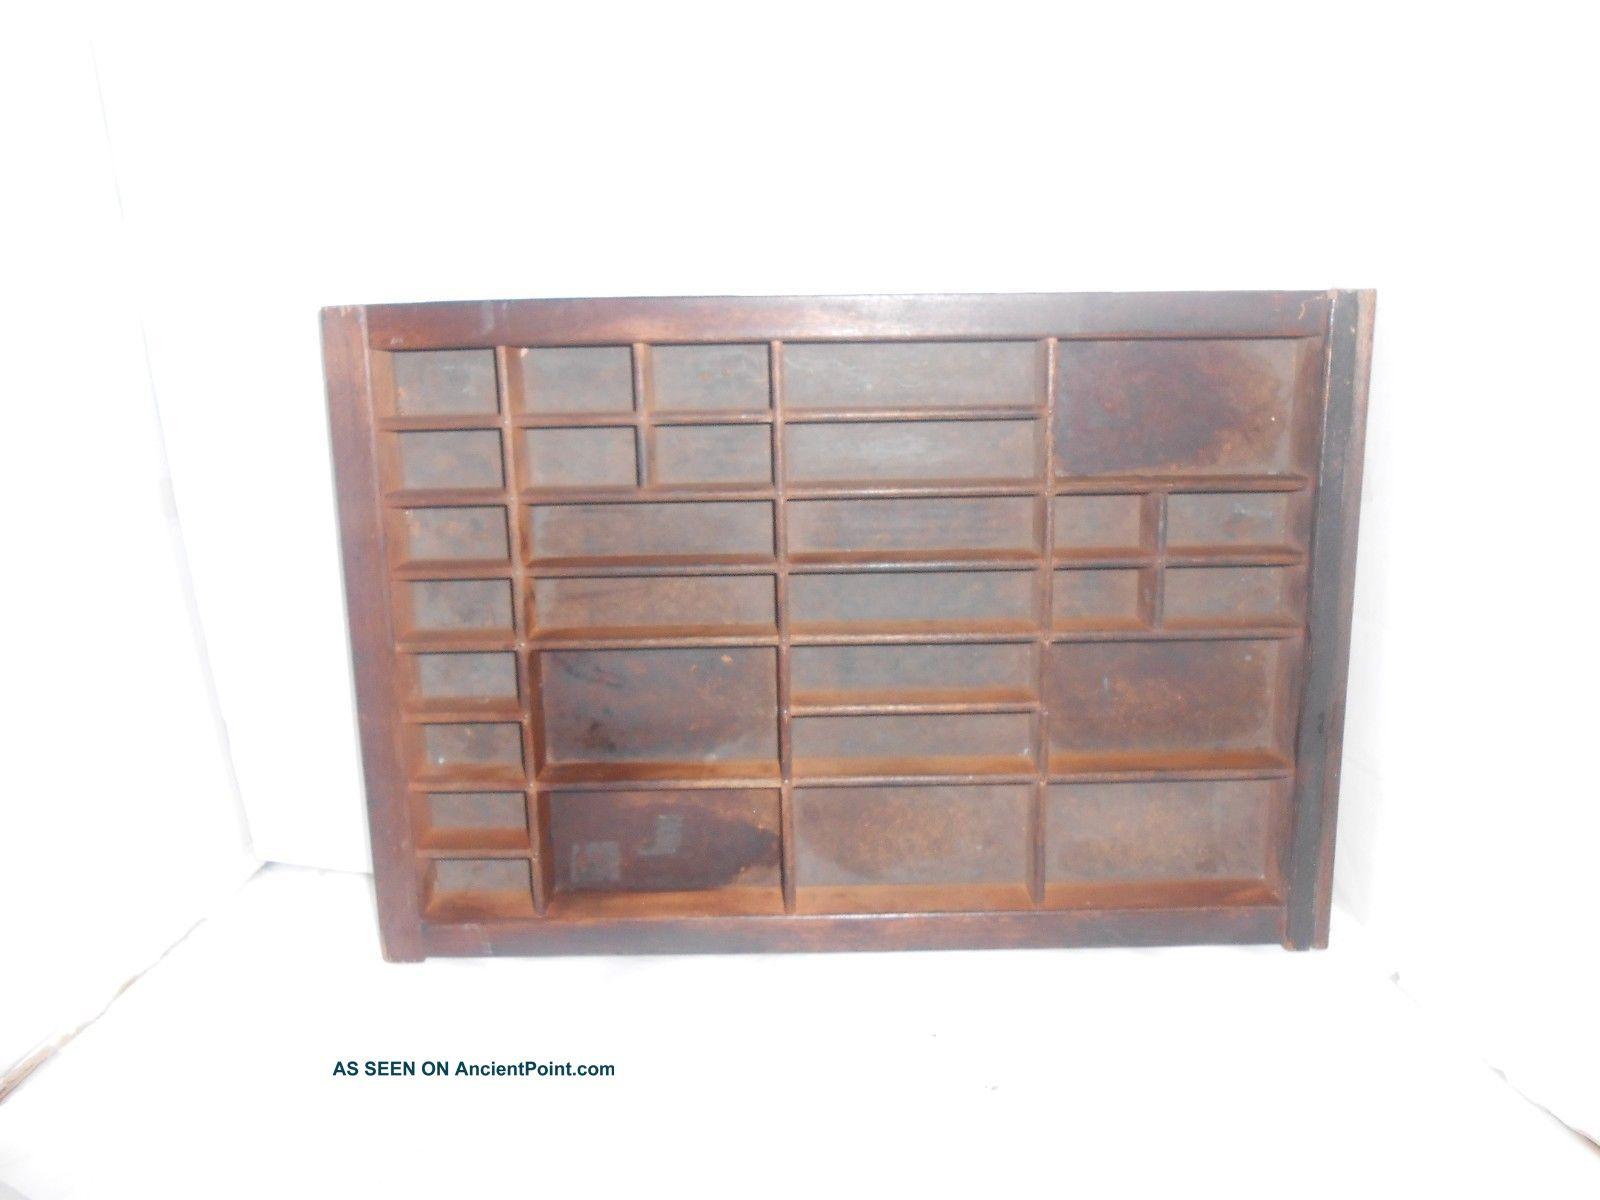 Vintage 30 Compartment Wood Printer ' S Typeset Drawer 14 1/4 X 16 1/2